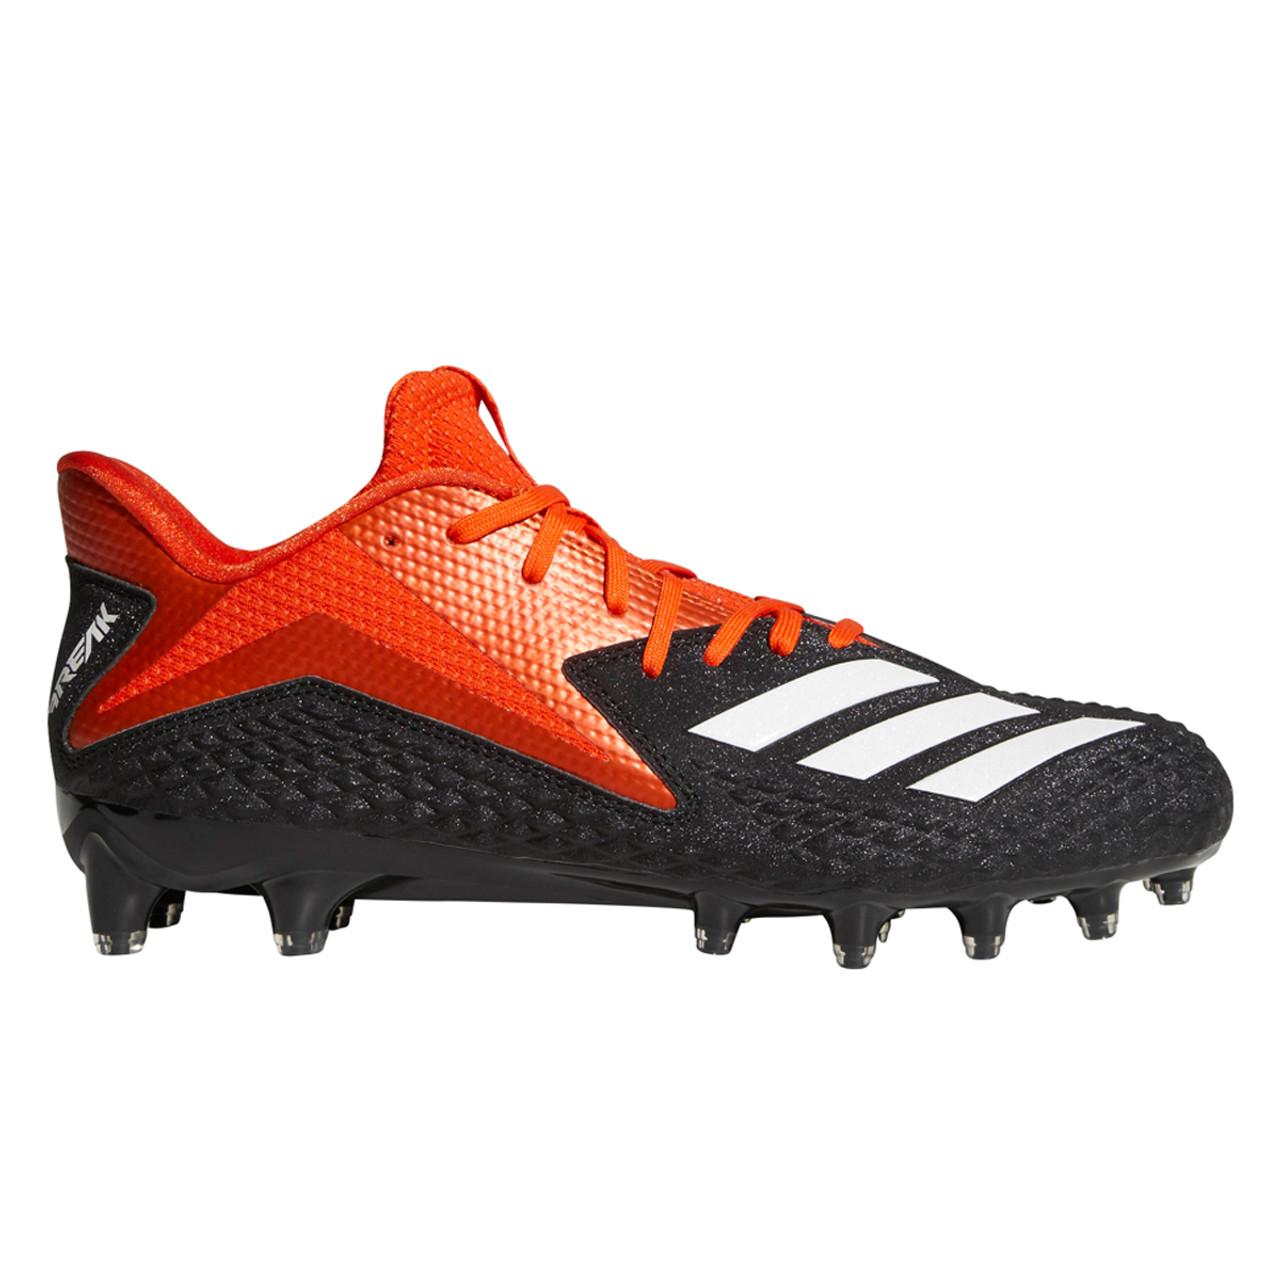 Orange and Black Football Cleats | Men